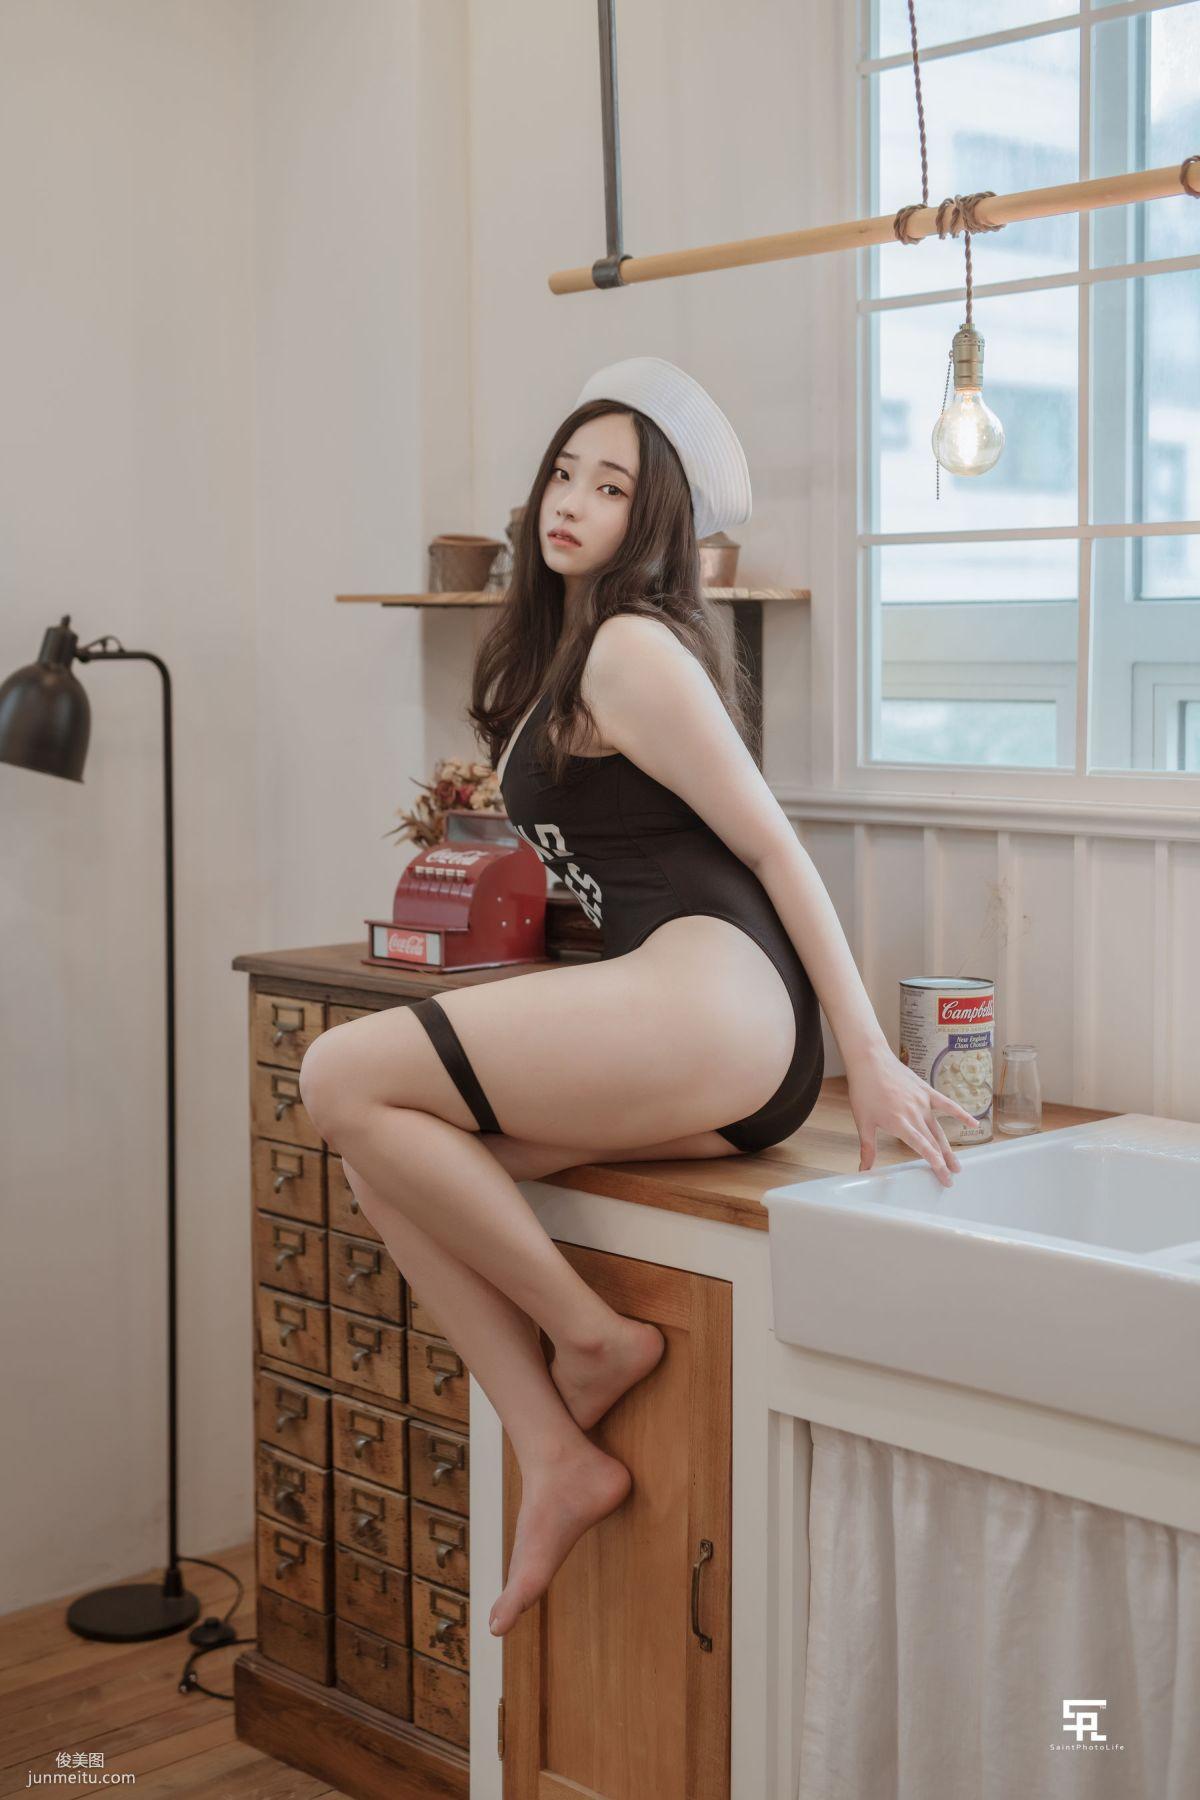 [saintphotolife] 韩国妹子BamBi - COS风格 写真合集1